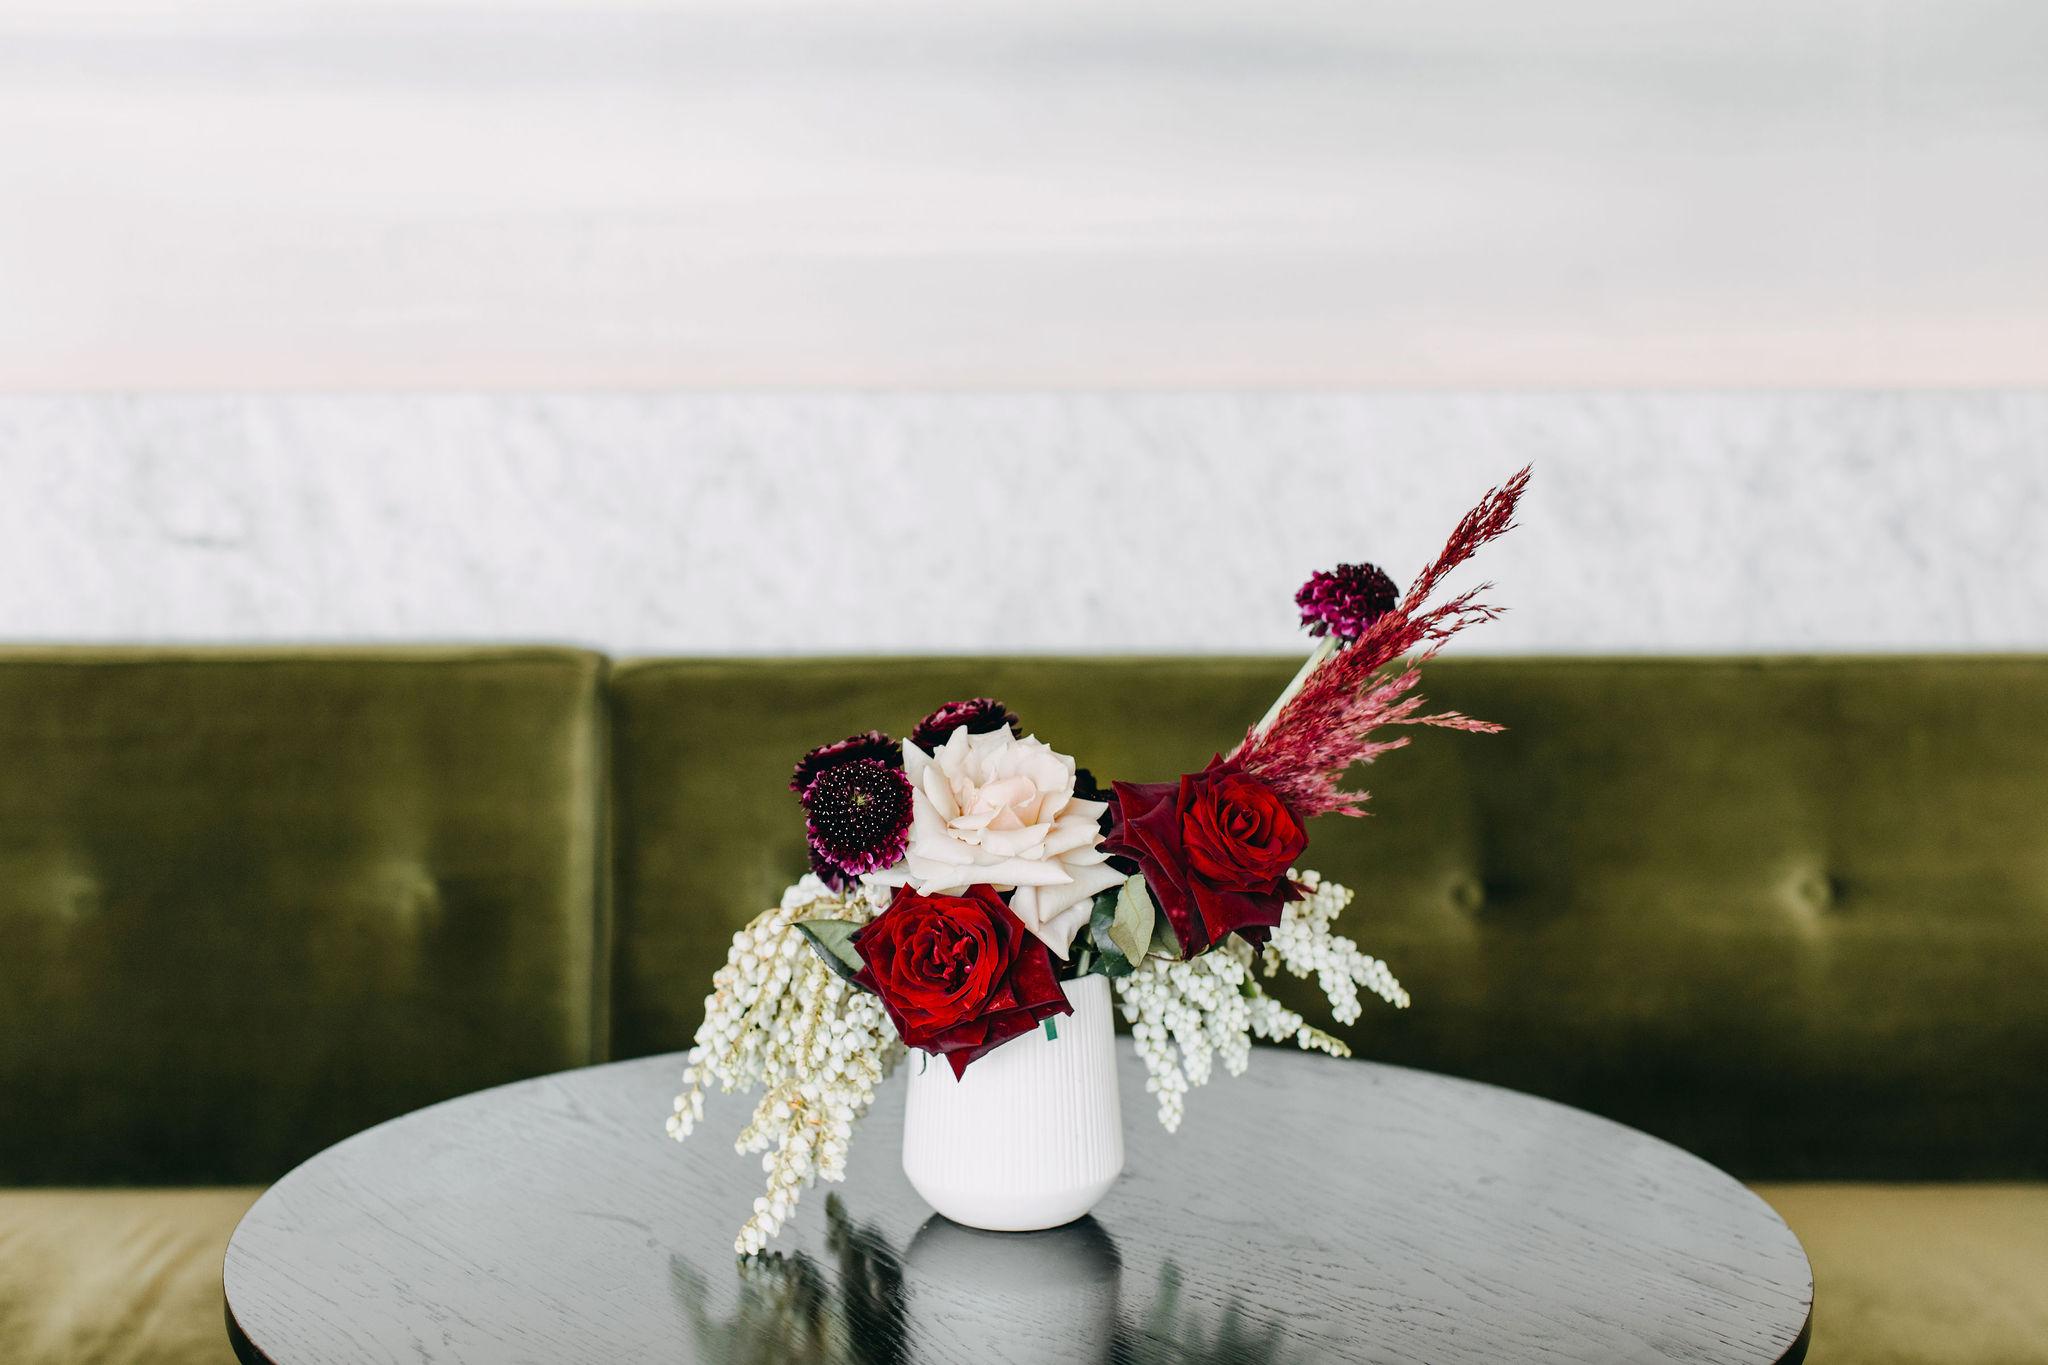 103-FOX&RABBIT-WEDDING-STATEBUILDINGS-26OCT2019